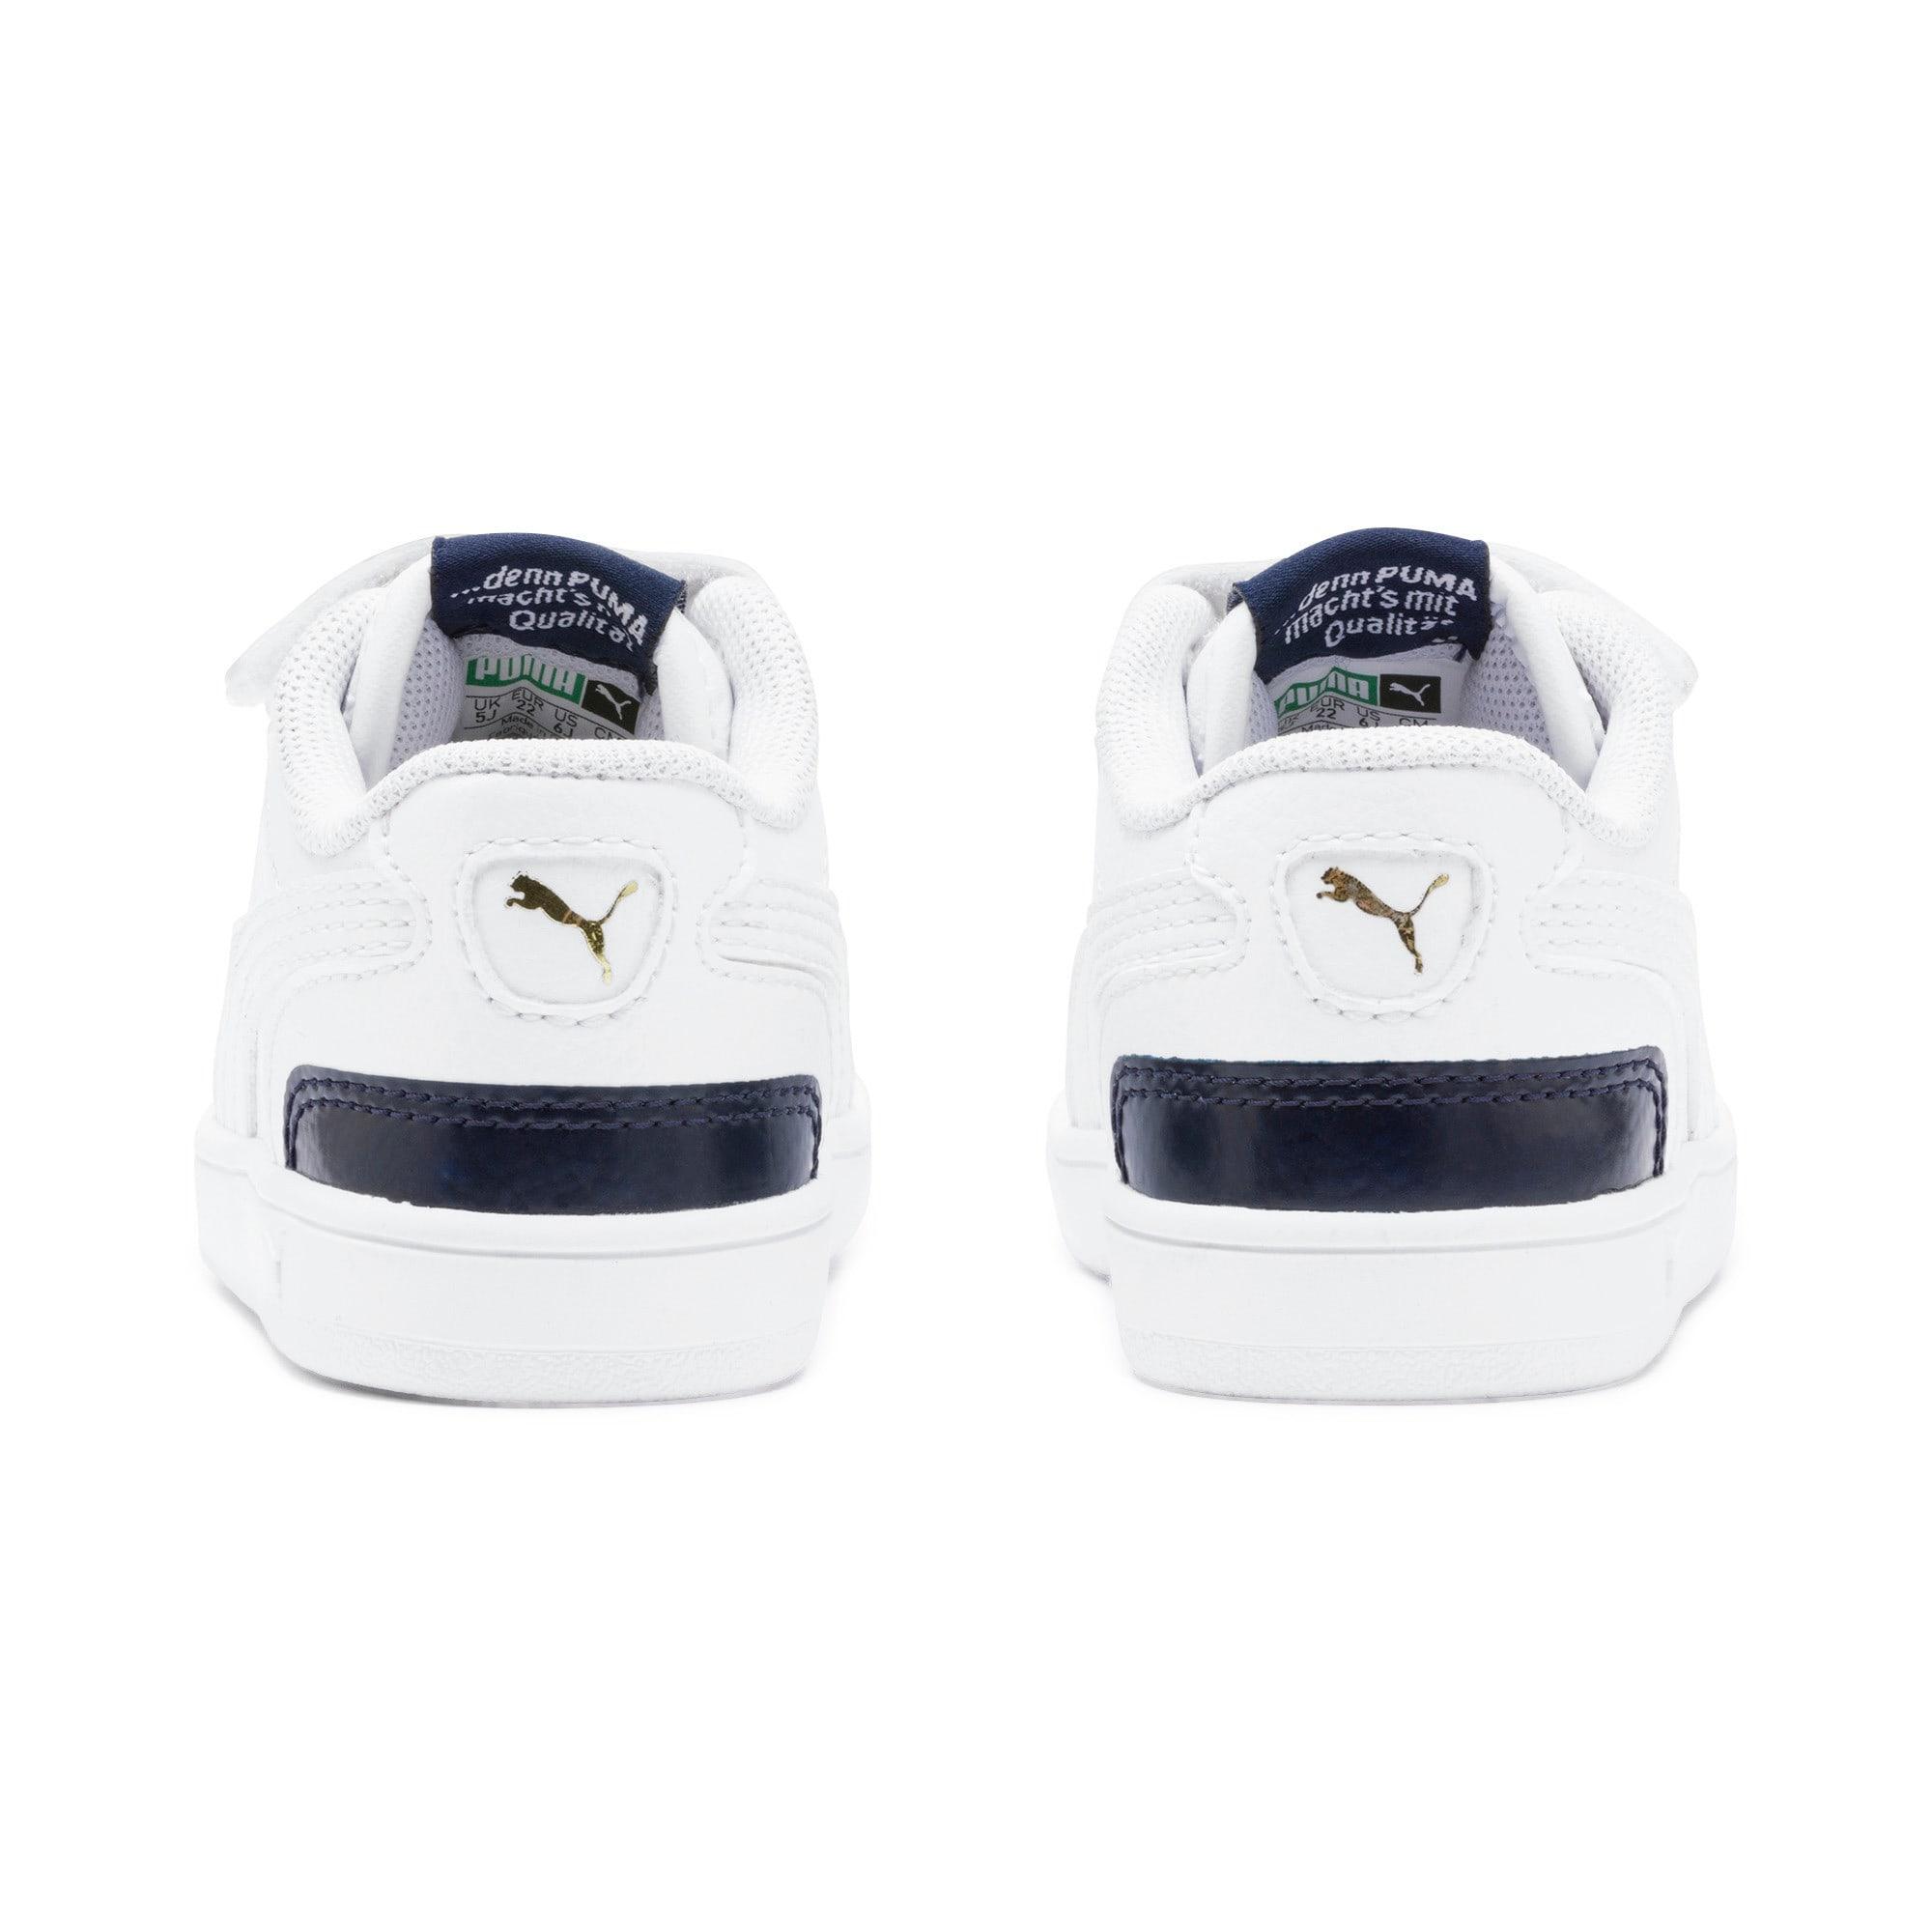 Thumbnail 3 of Ralph Sampson Low AC Toddler Shoes, White-Peacoat-White, medium